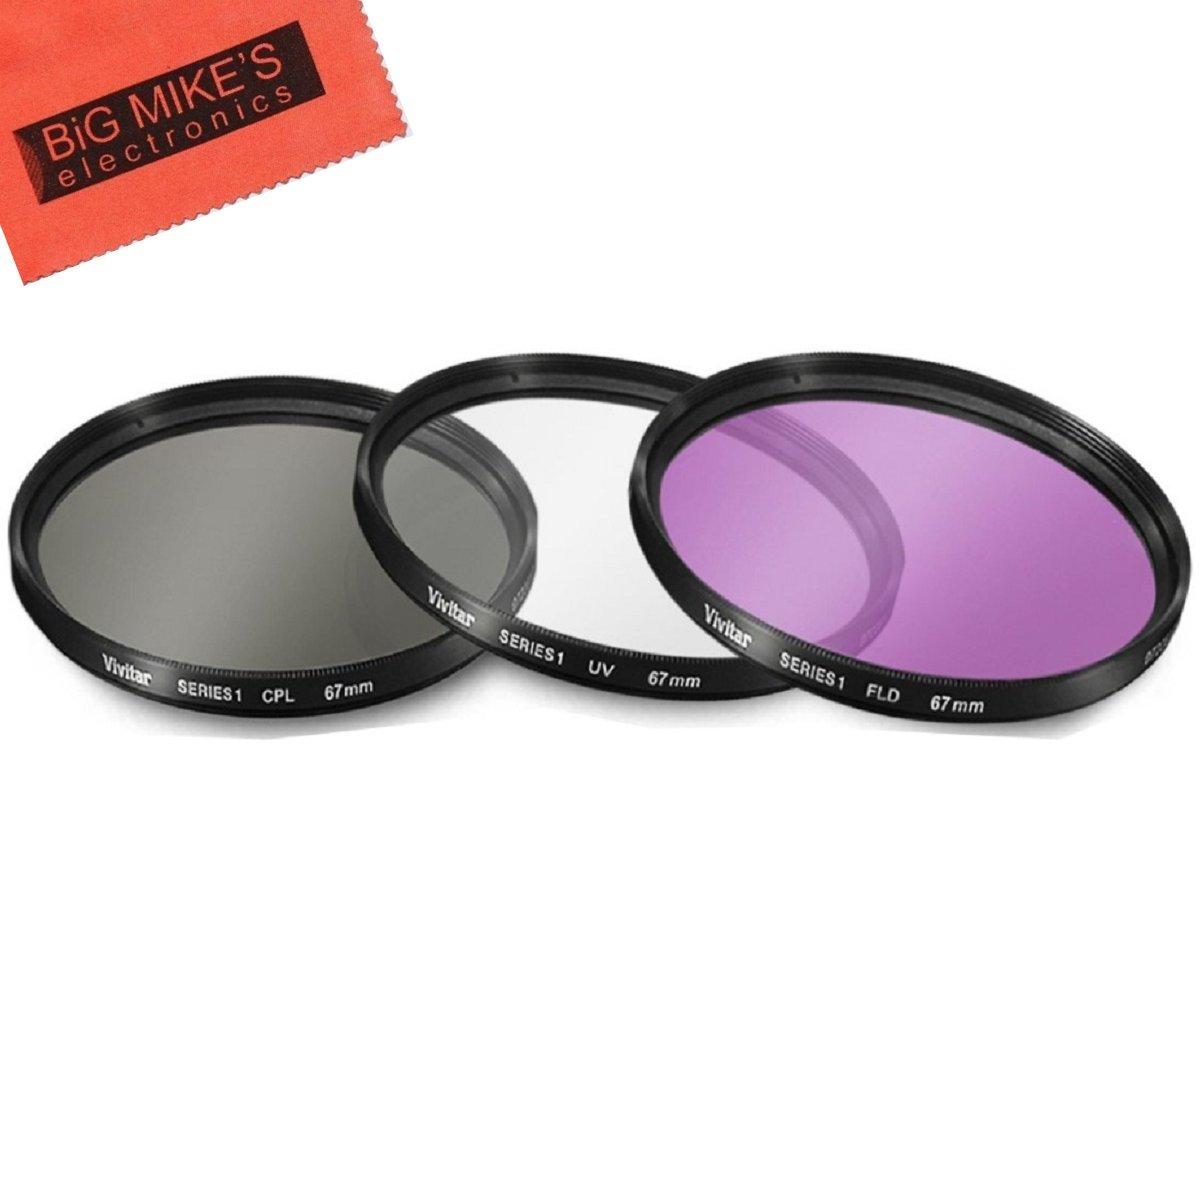 67mm Multi-Coated 3 Piece Filter Kit (UV-CPL-FLD) for Nikon CoolPix P900 Digital Camera